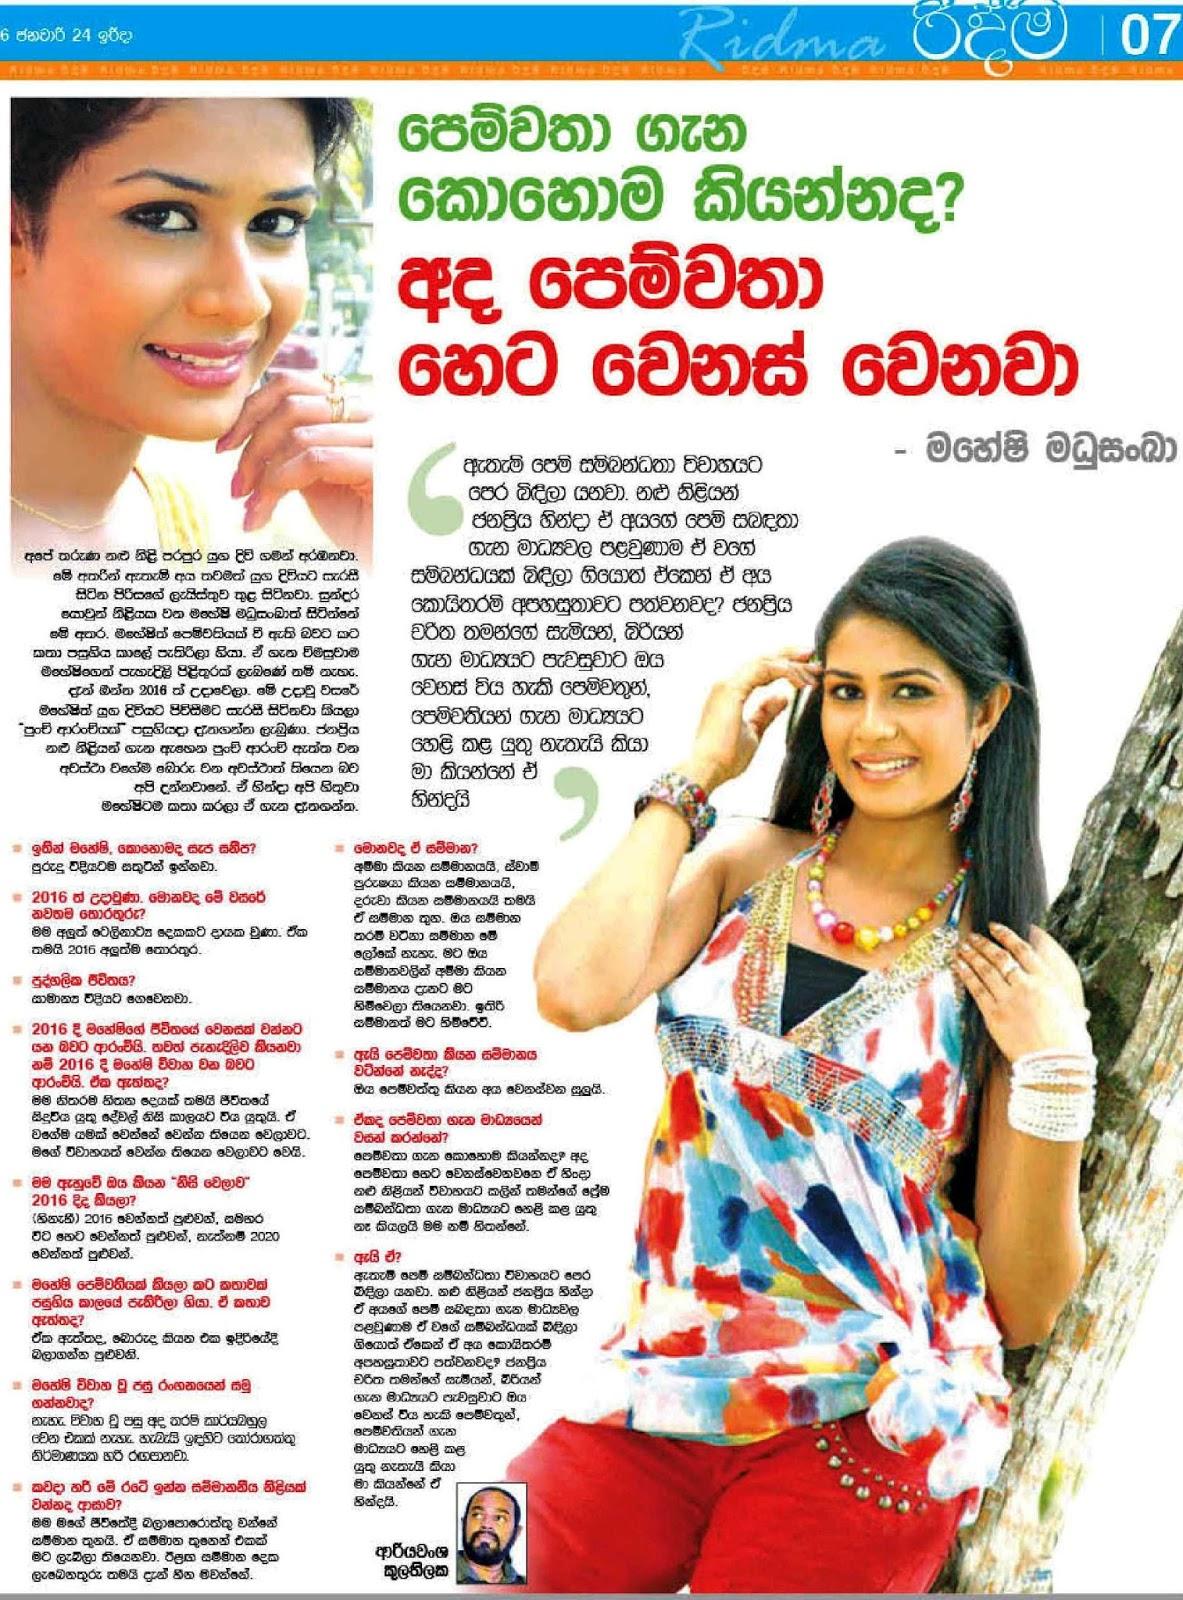 Sri Lankan Actress and Hot Models Maheshi Madushanka - gossip lanka